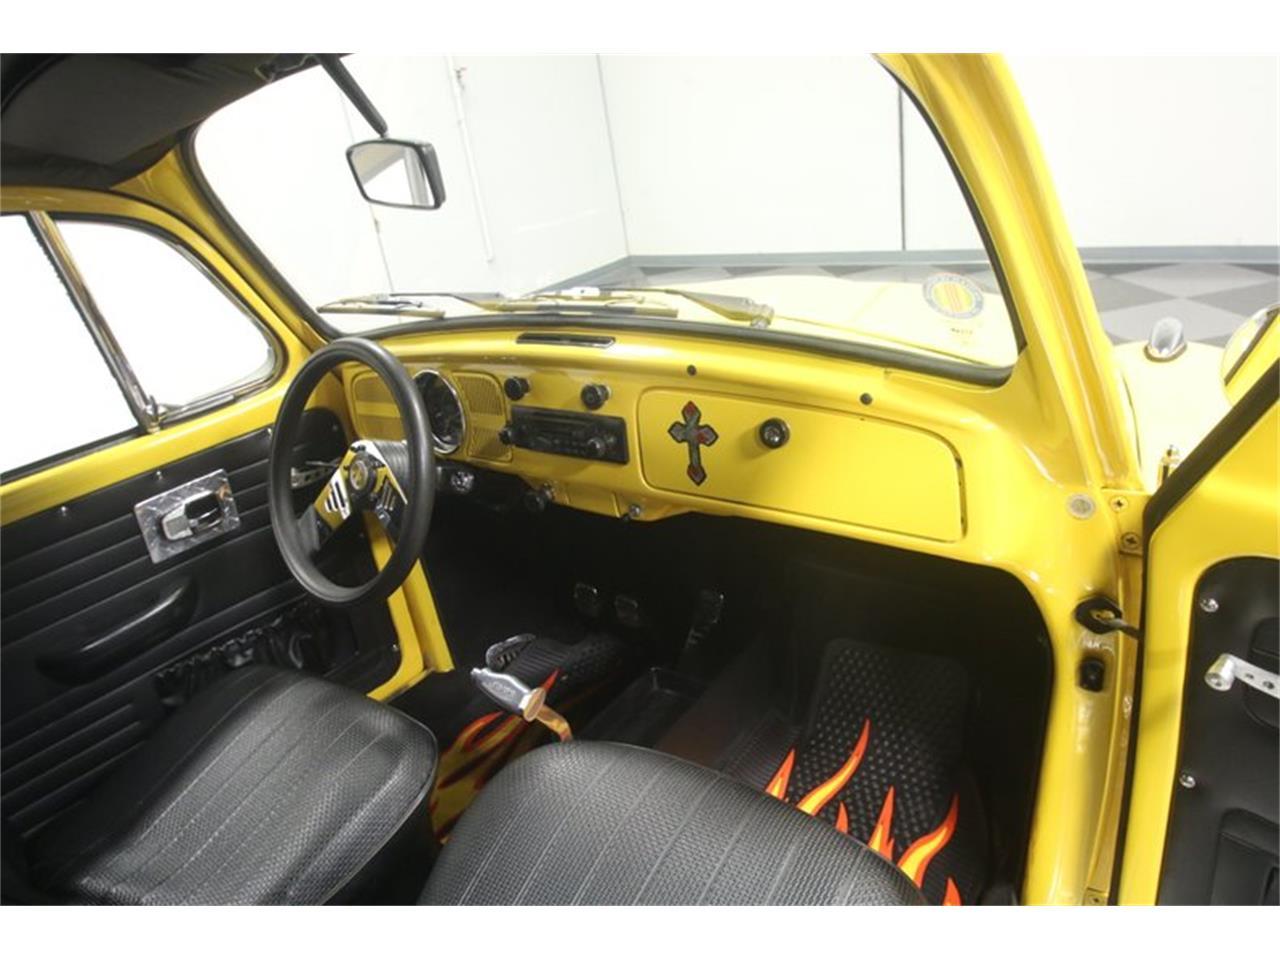 Large Picture of 1969 Volkswagen Baja Bug - $14,995.00 - N8PC